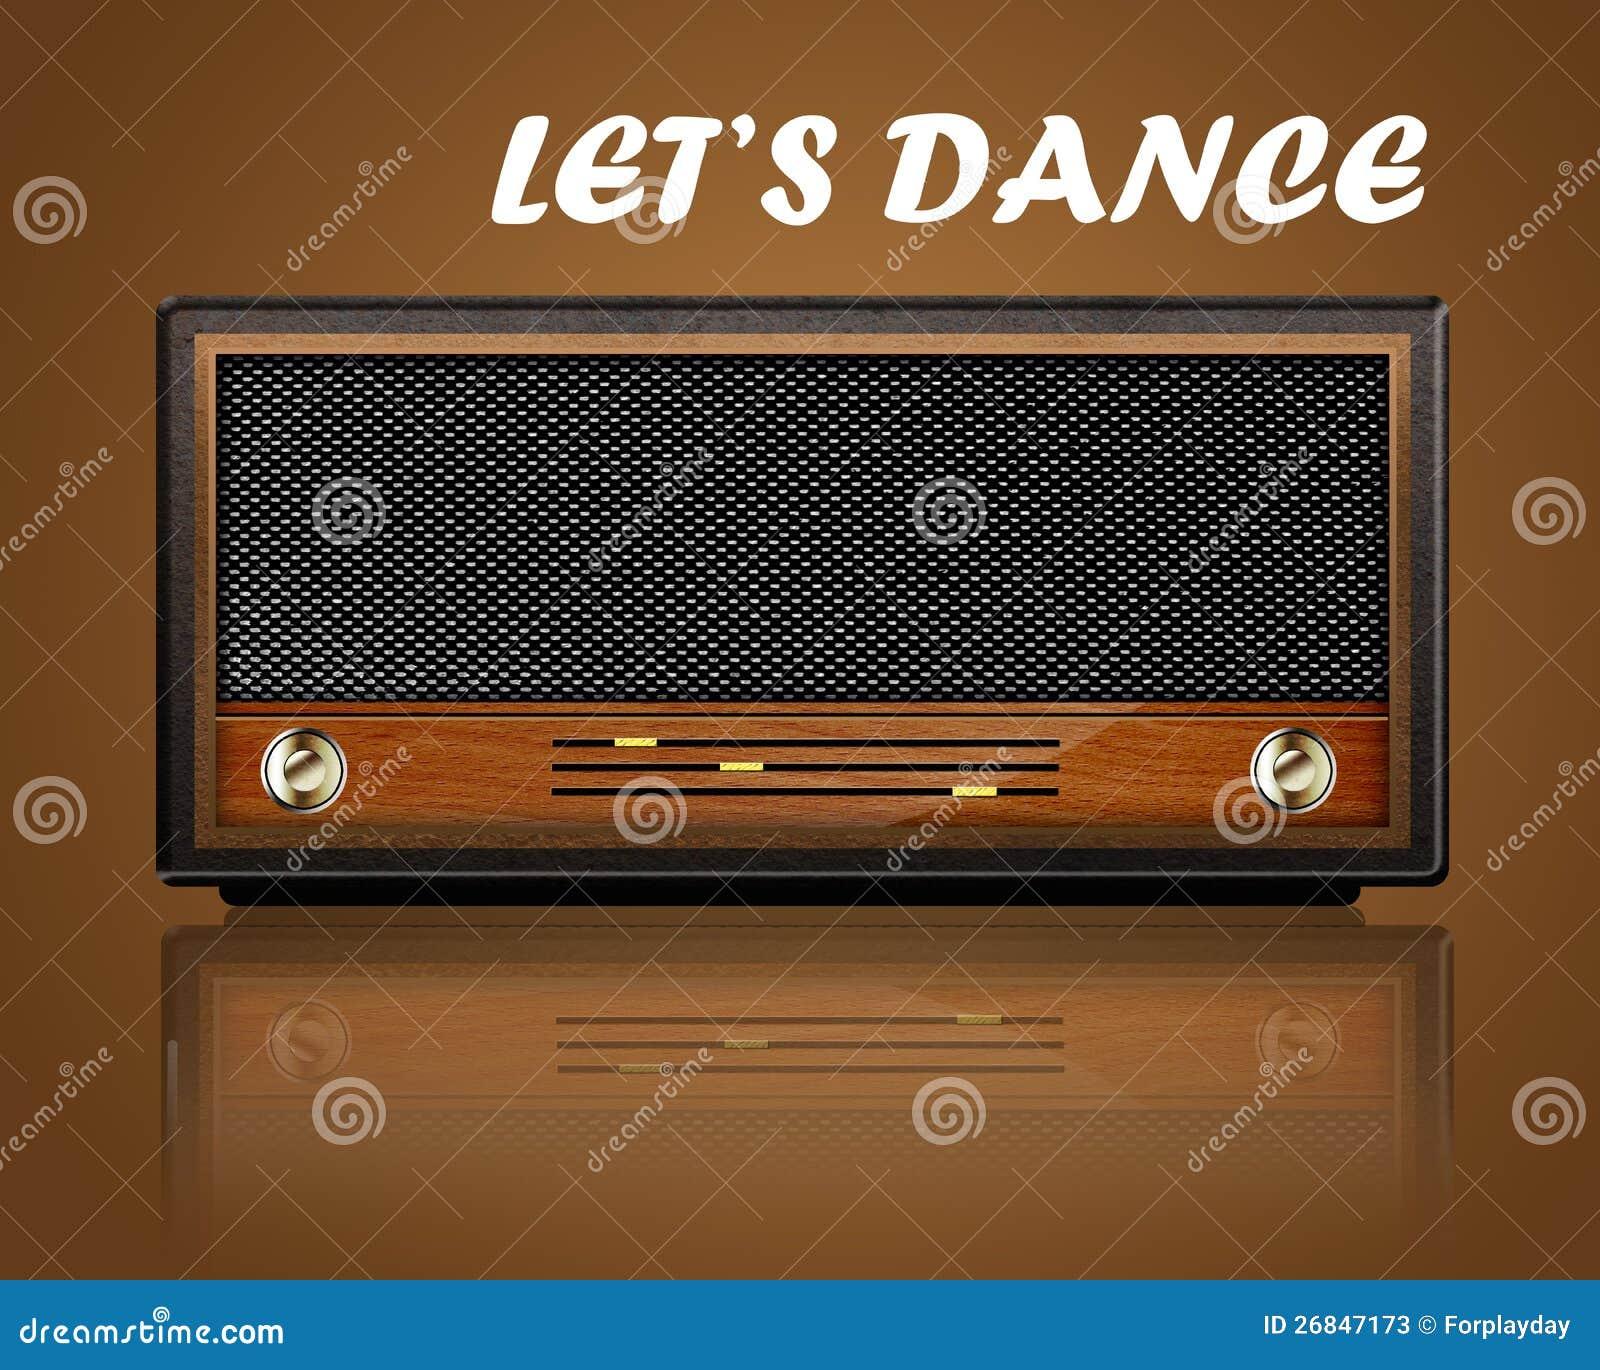 Radio Lets Dance